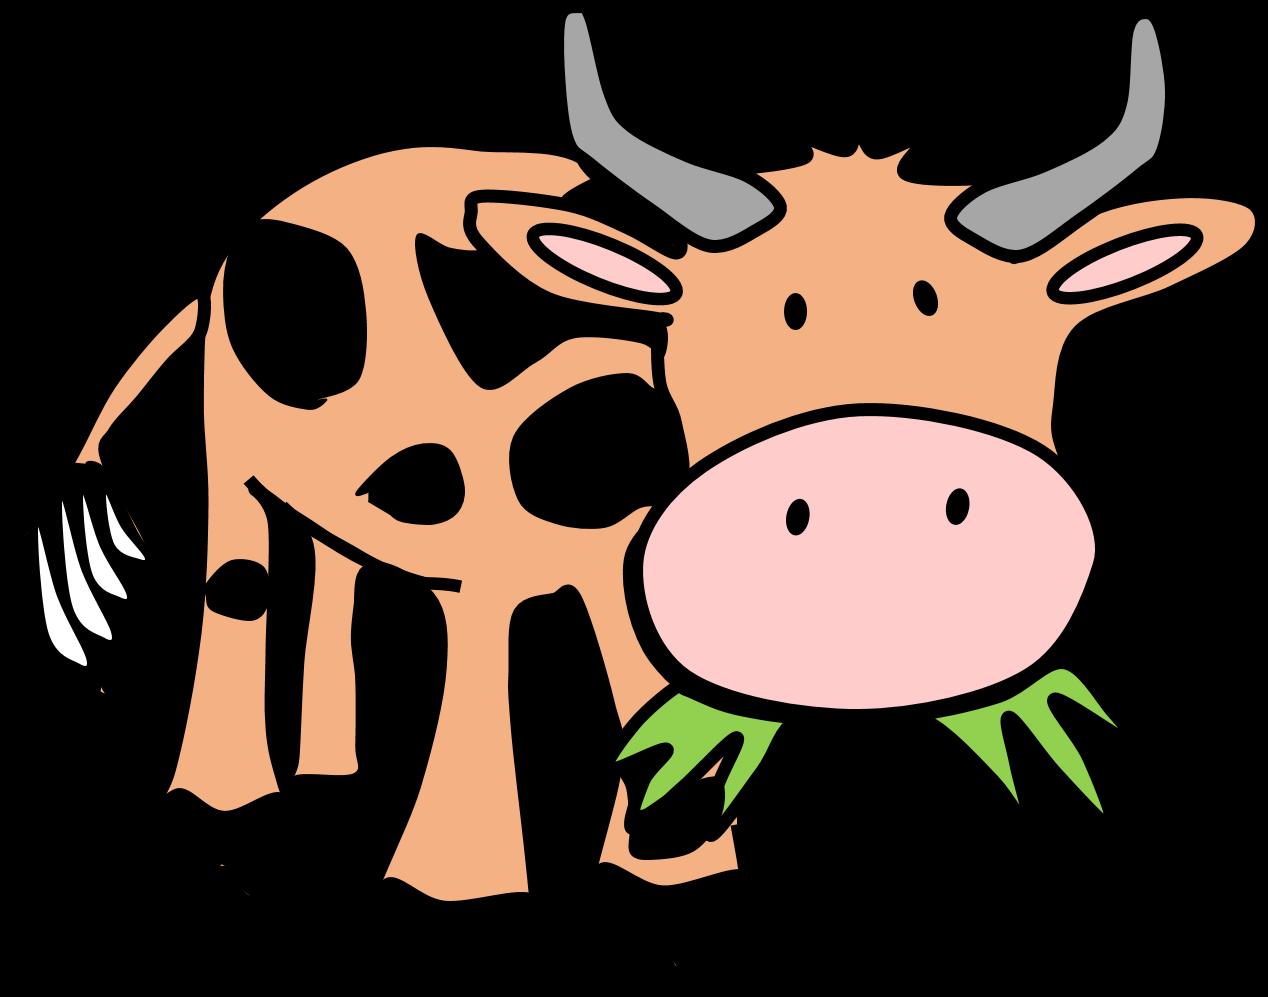 Farm animal clipart transparent background.